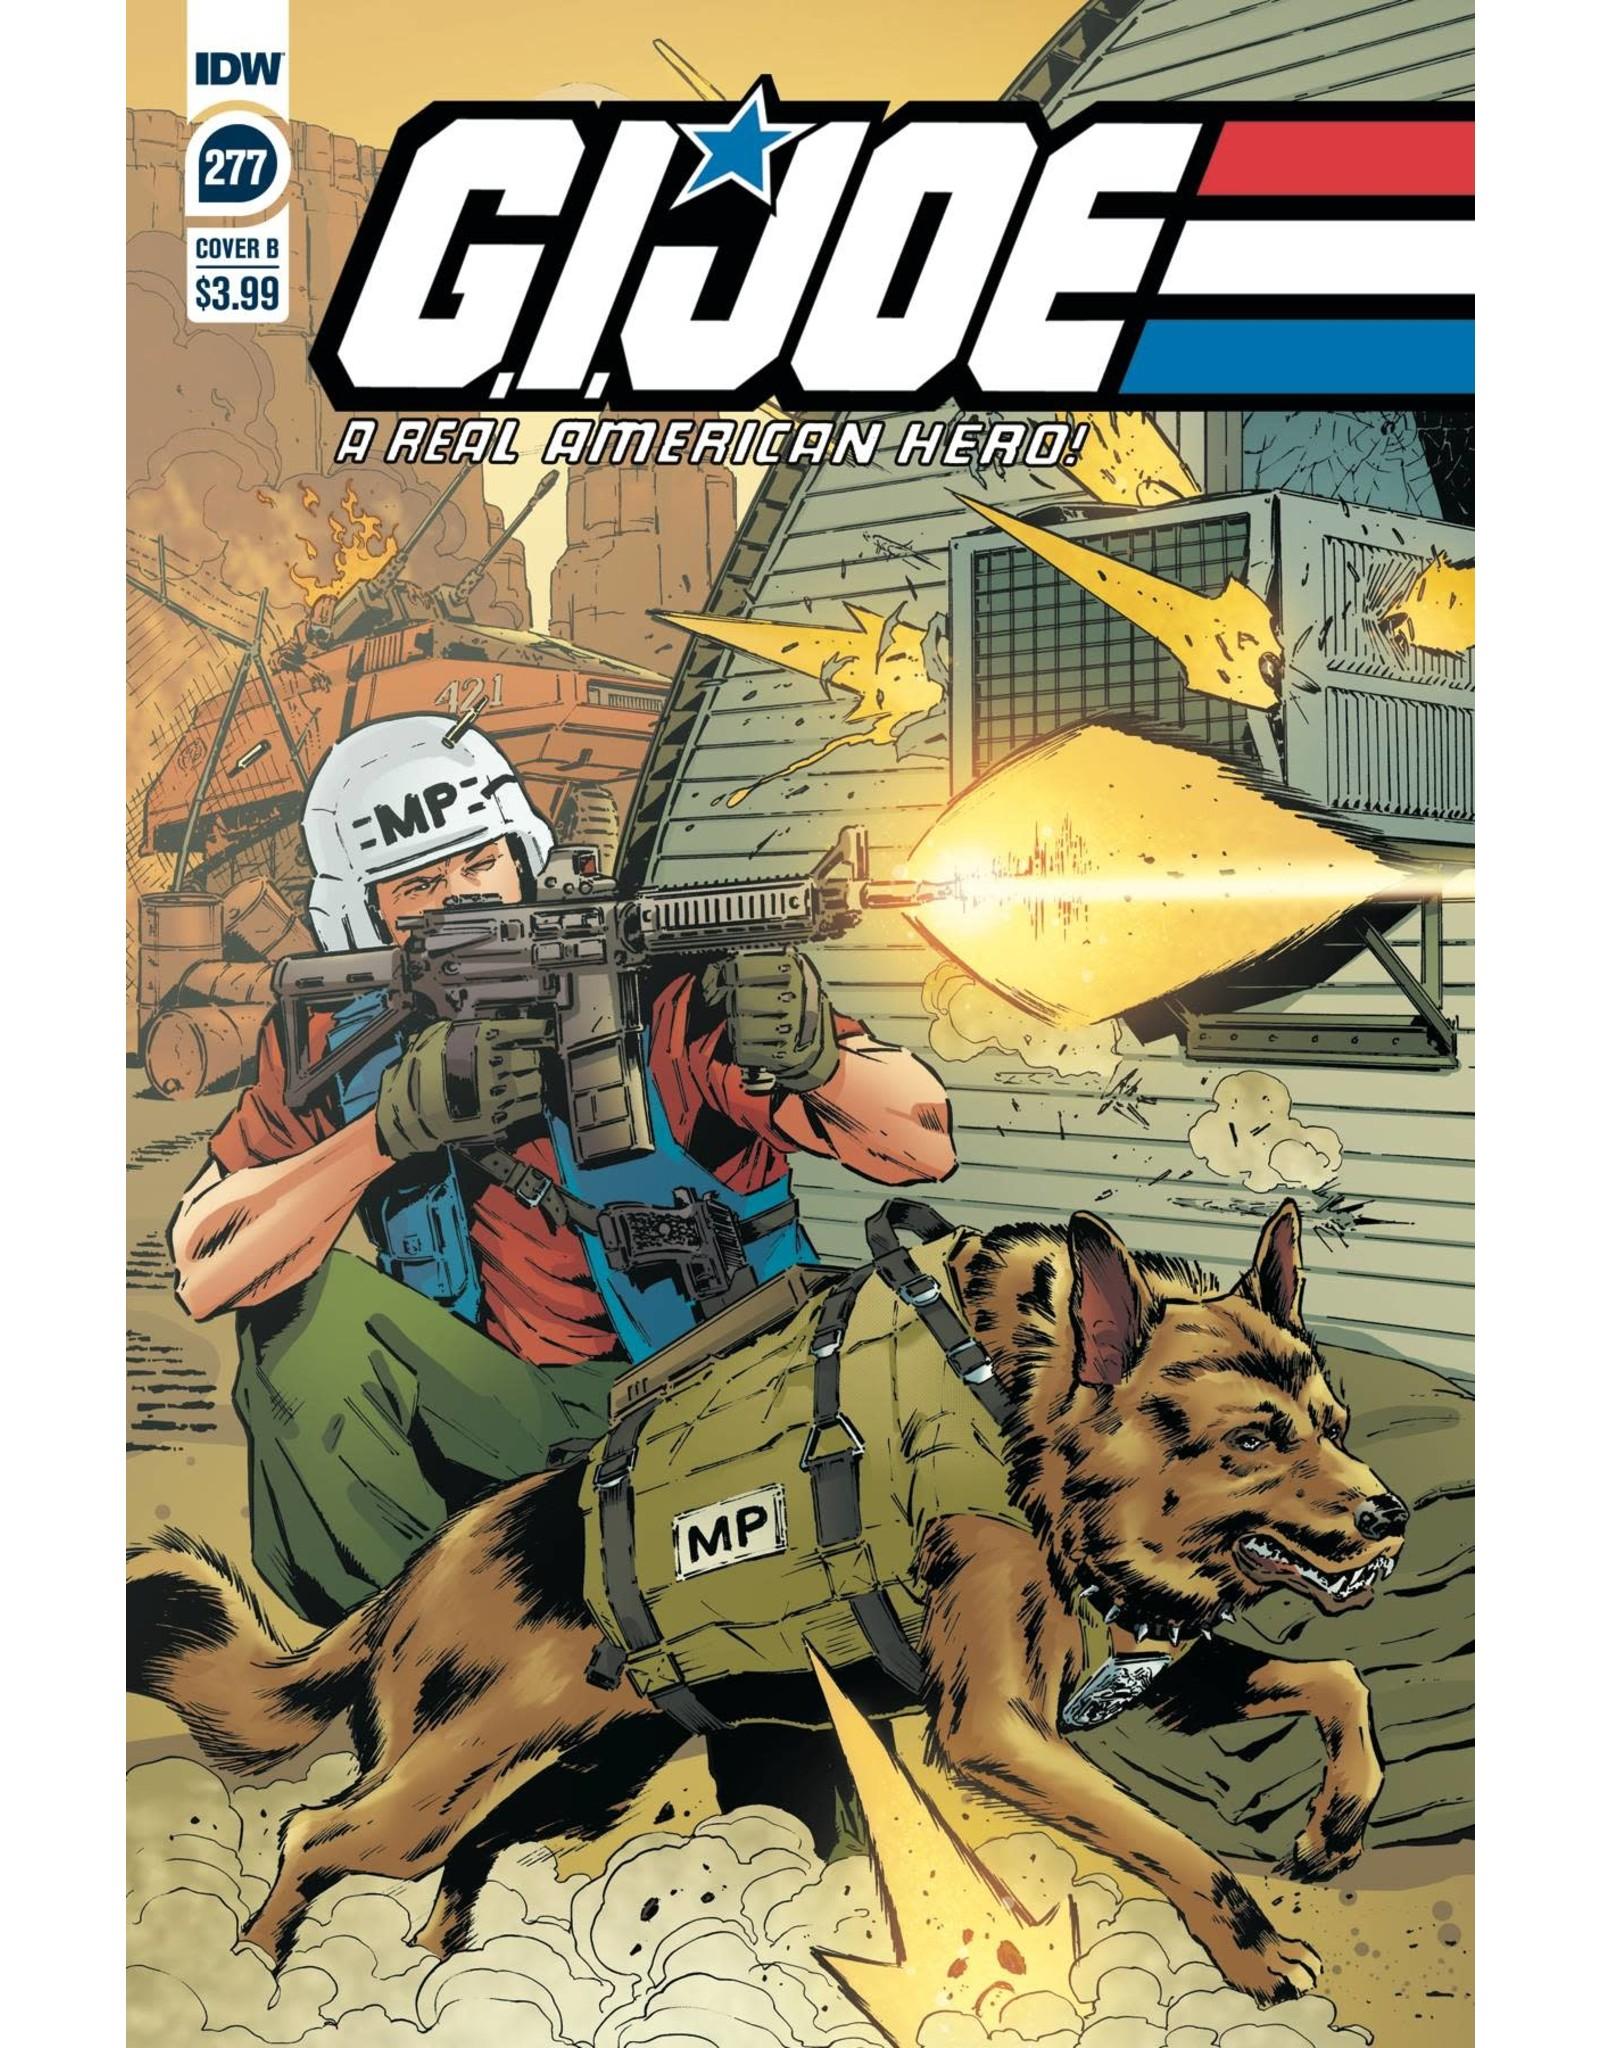 IDW PUBLISHING GI JOE A REAL AMERICAN HERO #277 CVR B SL GALLANT